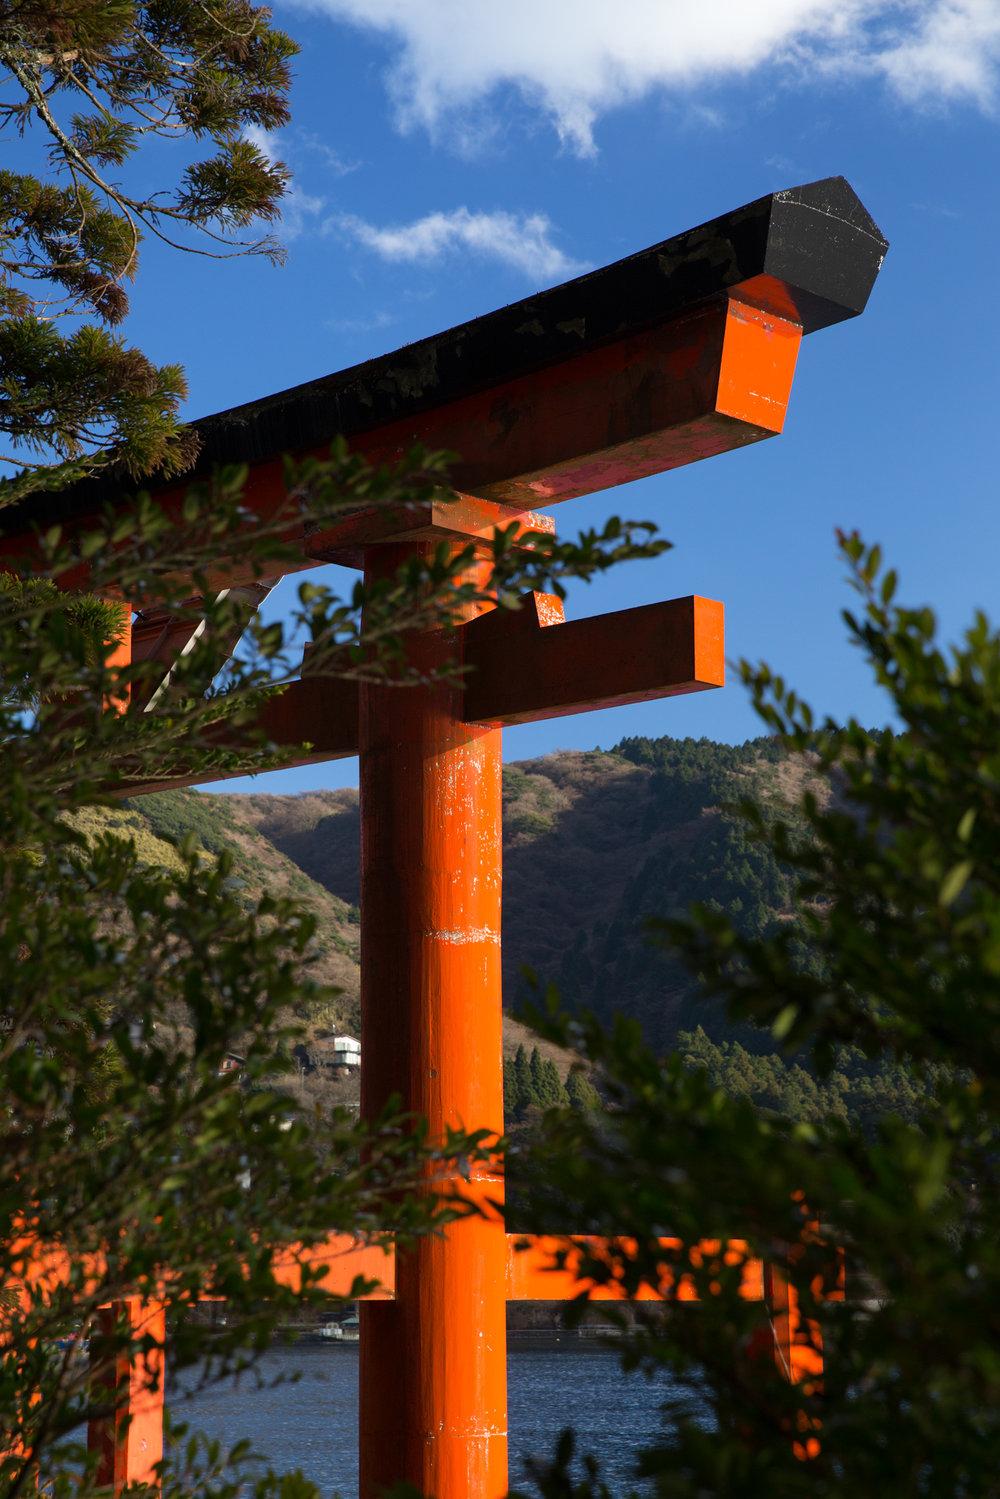 6888-japan-nature-classic-perspective.jpg